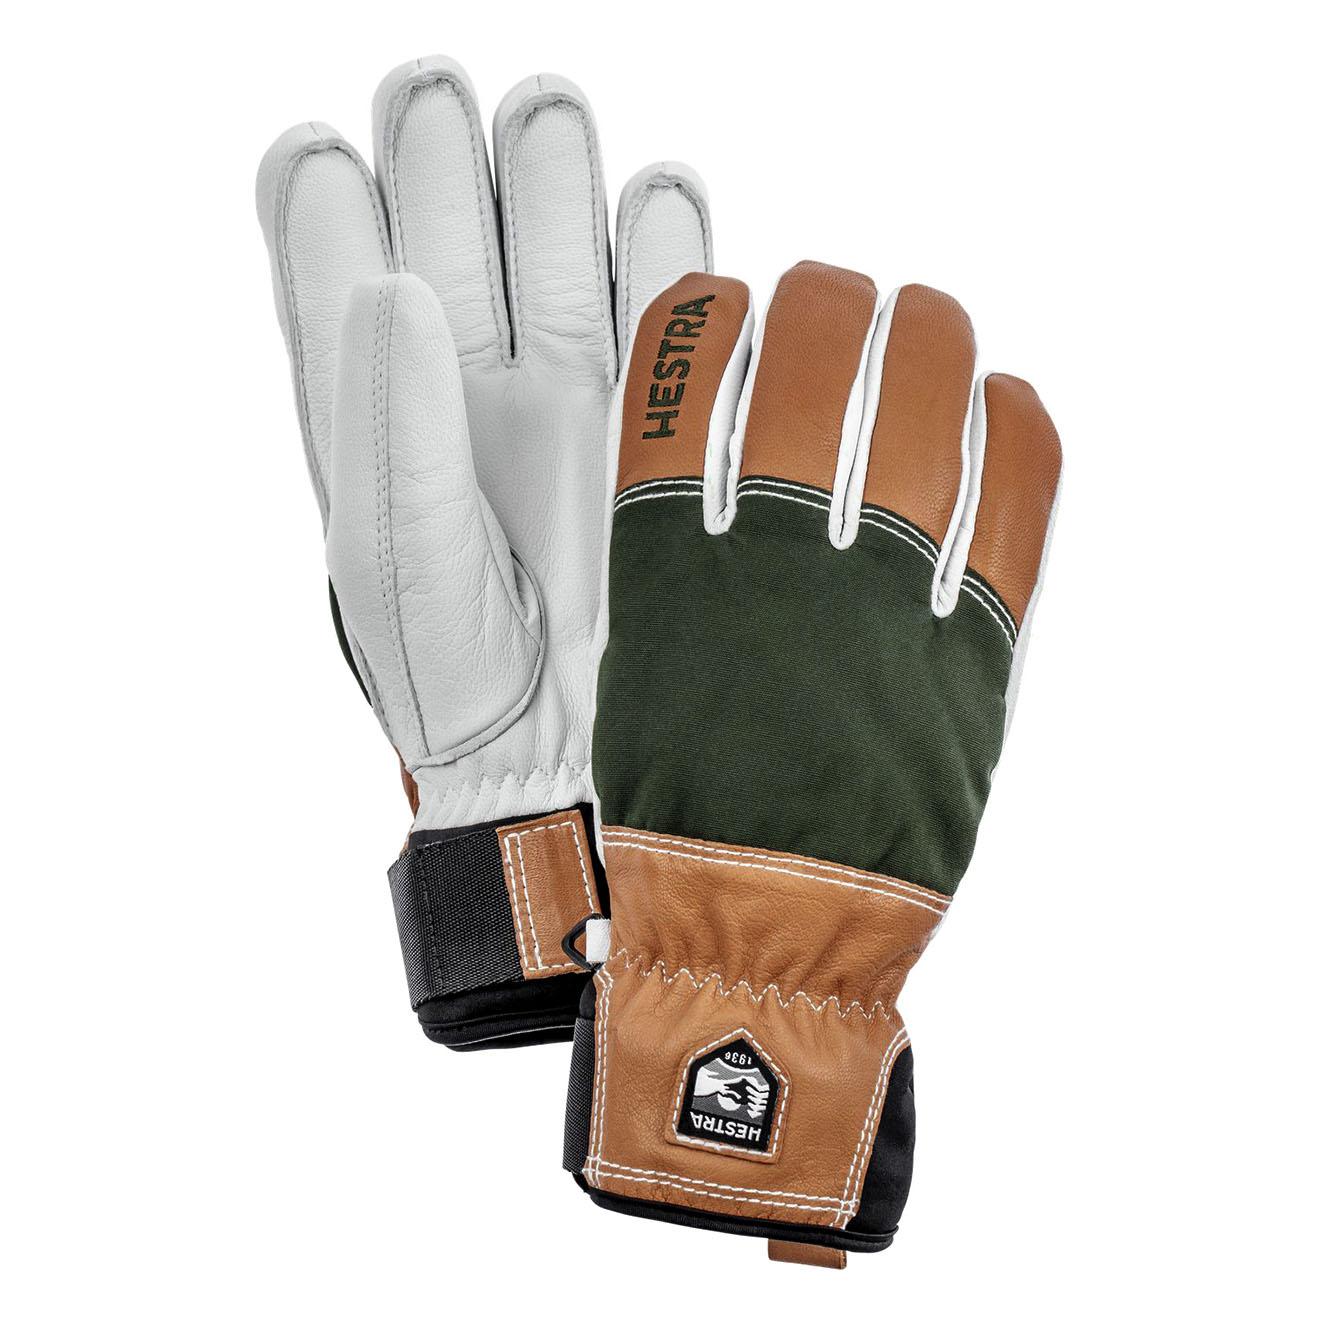 447720343663a Hestra Army Leather Abisko Mens Glove Dark Green - The Sporting Lodge